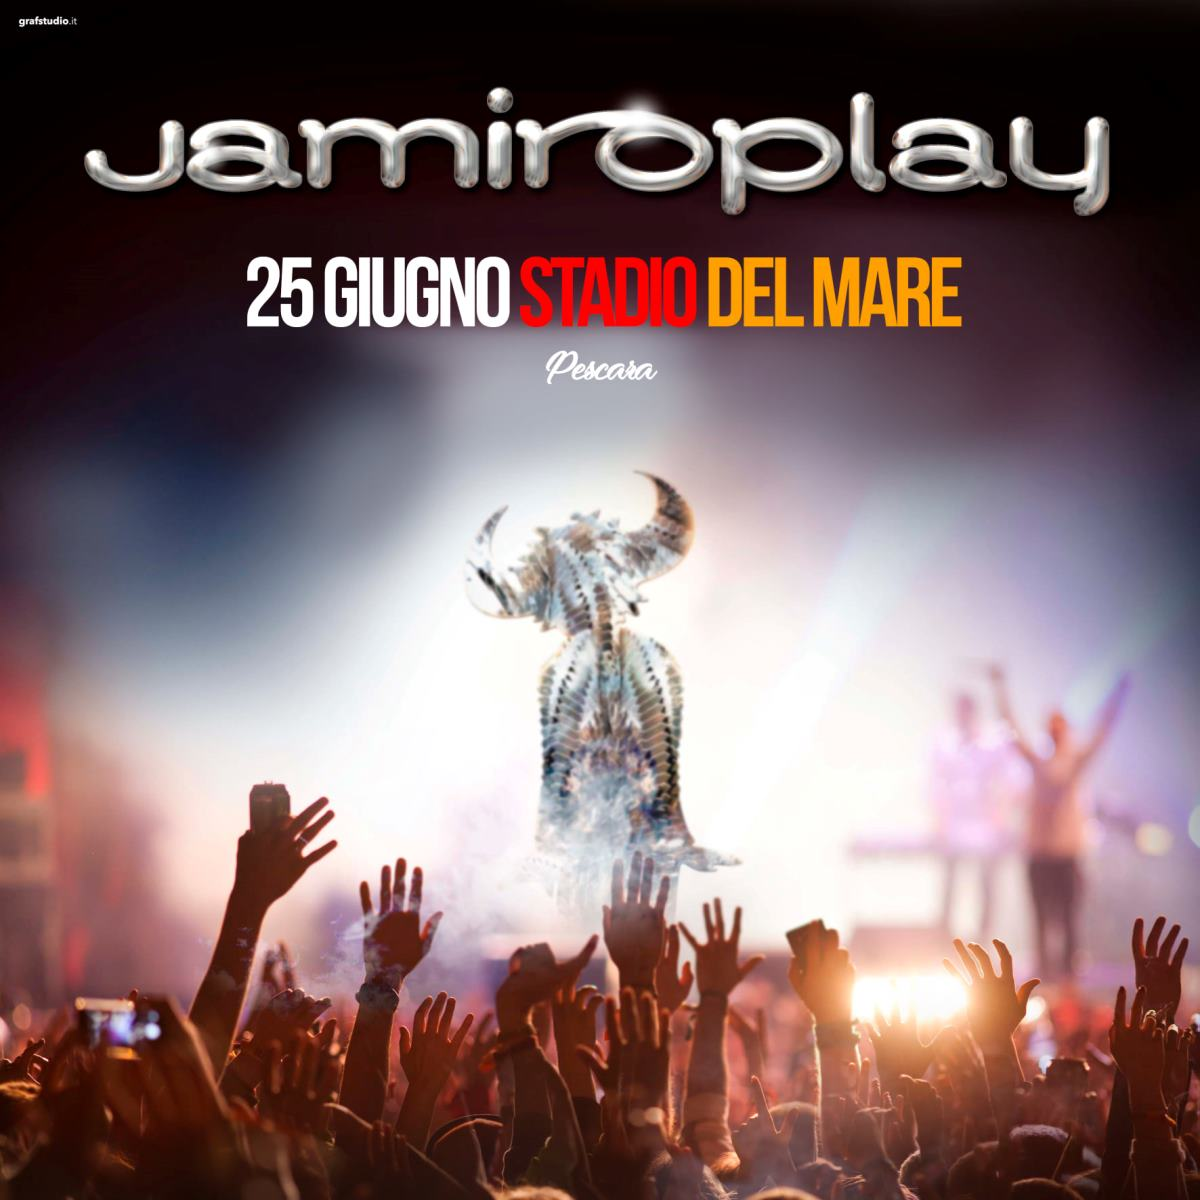 Venerdì 25 giugno 2021 Jamiroplay live al Pescara City Summer